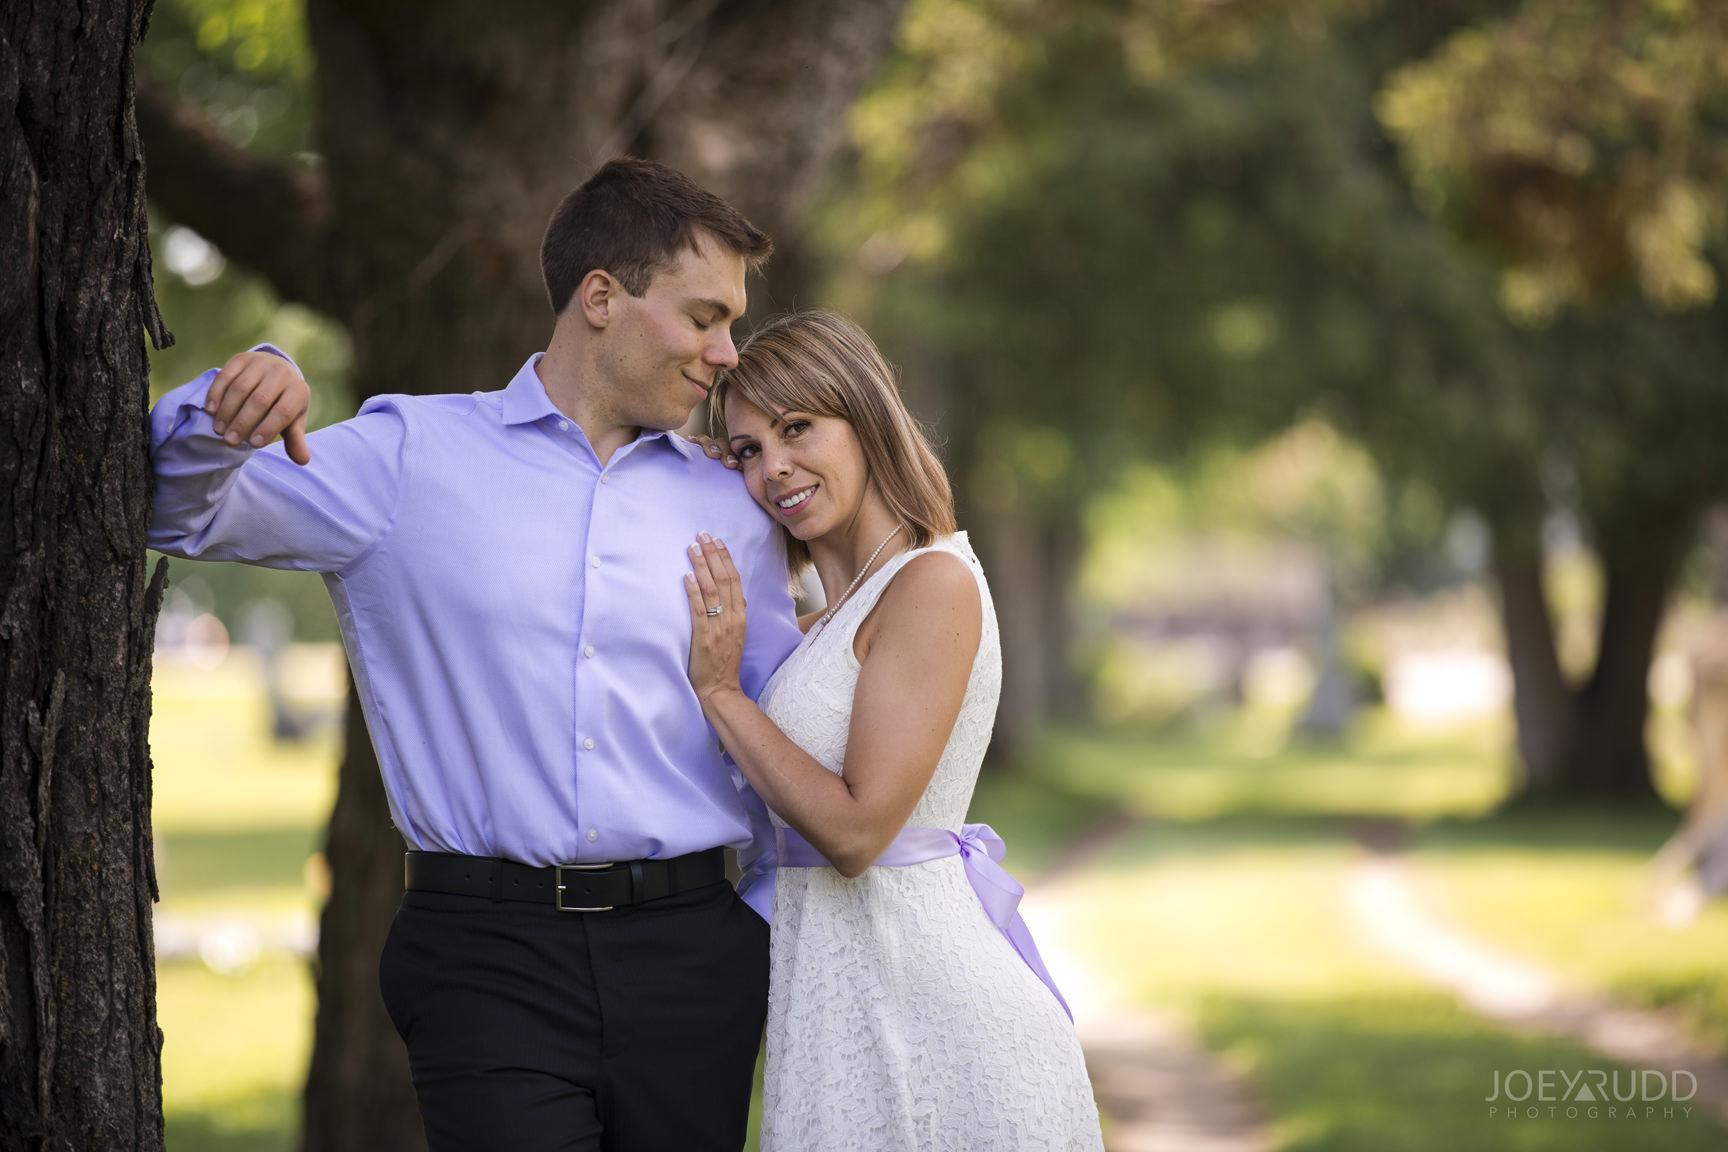 Elopement Wedding Ottawa Photographer Elope Photography Joey Rudd Photographer Richmond